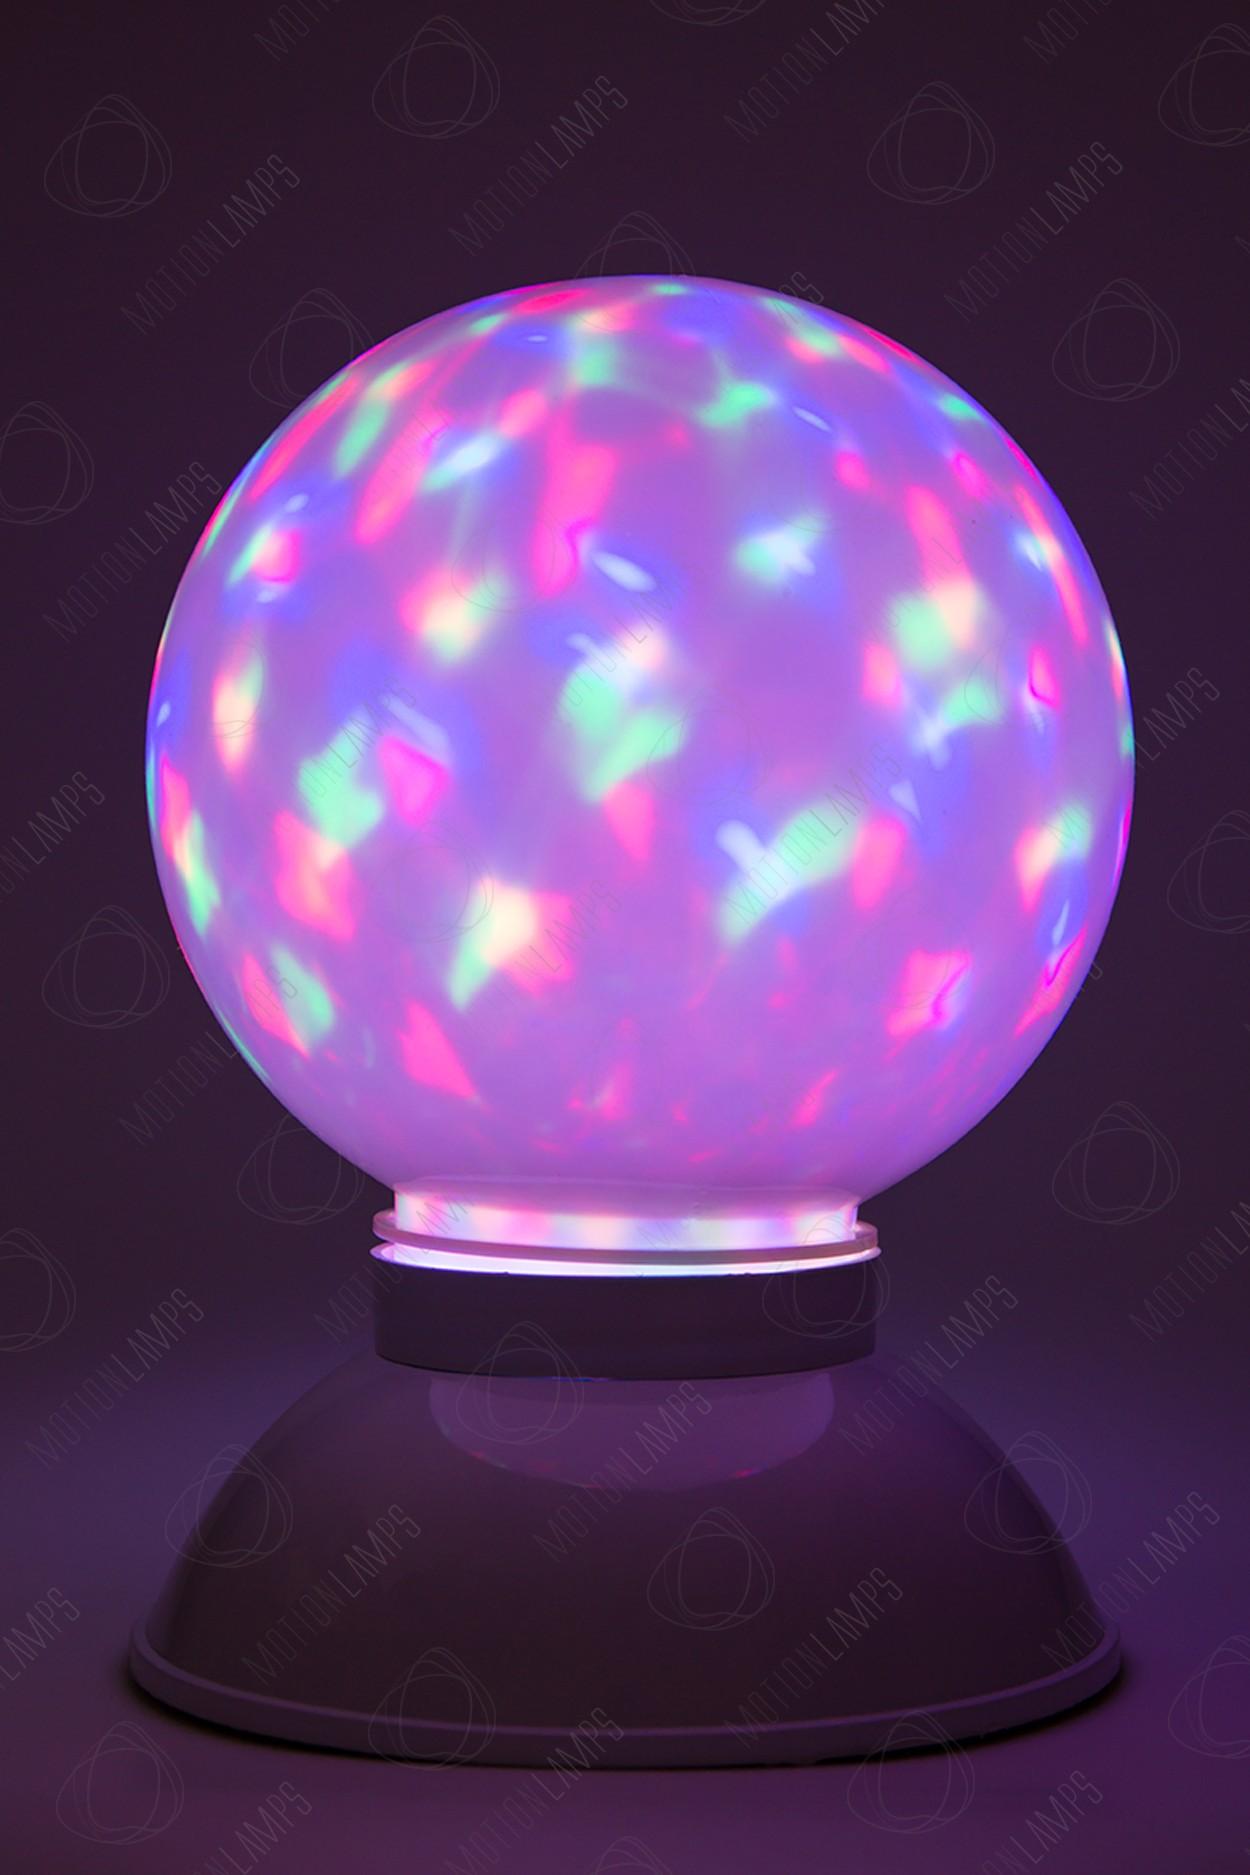 Светодиодный диско-шар LED WhiteBall (d - 19см)